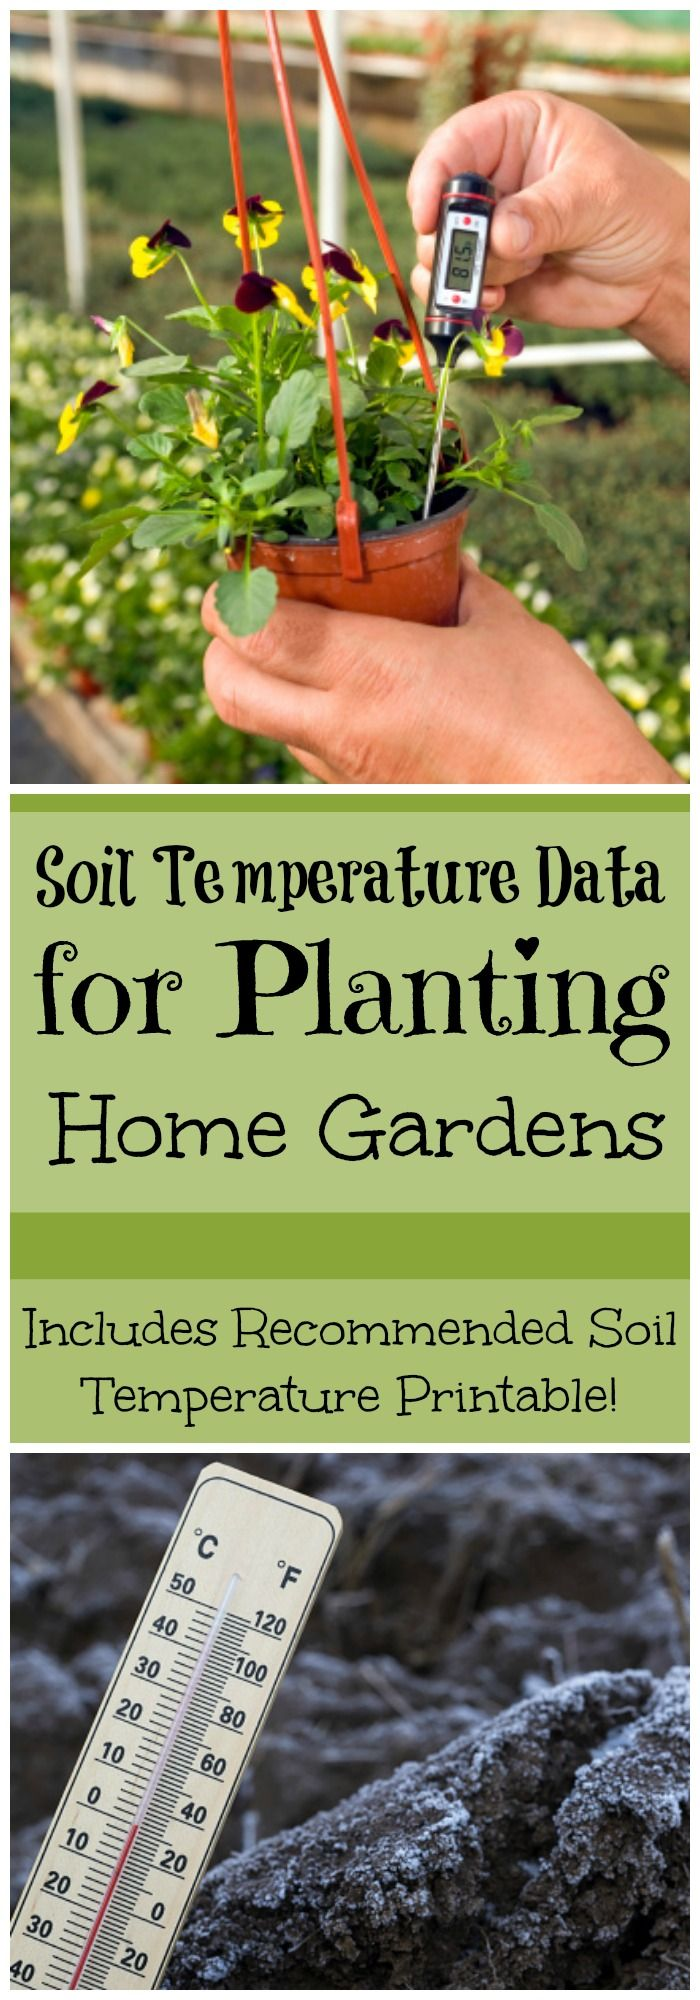 Soil Temperature Data | How to Measure Soil Temperature for Home Garden | Garden Planting | Home Gardens | Farm and Garden